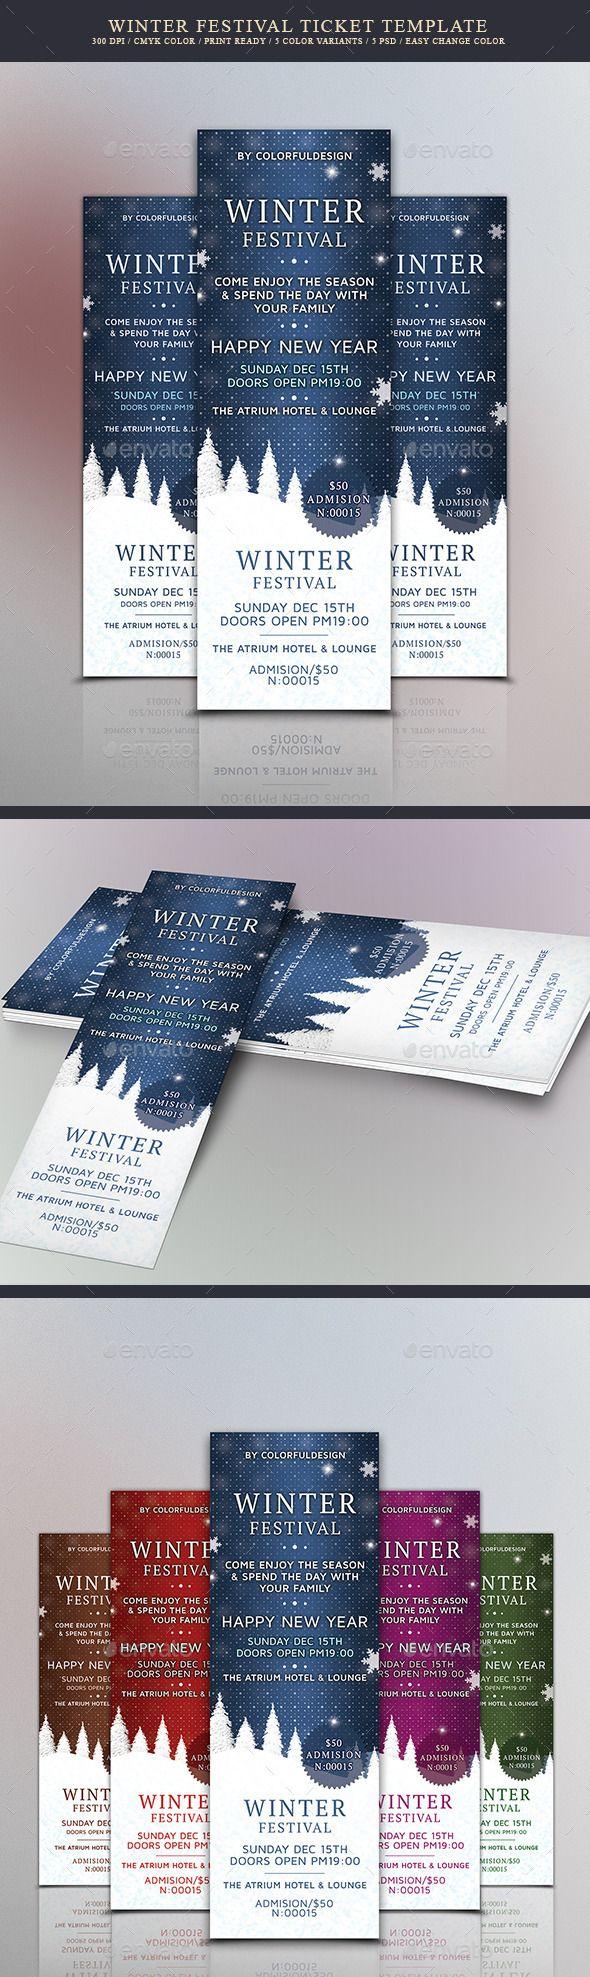 make event tickets online free